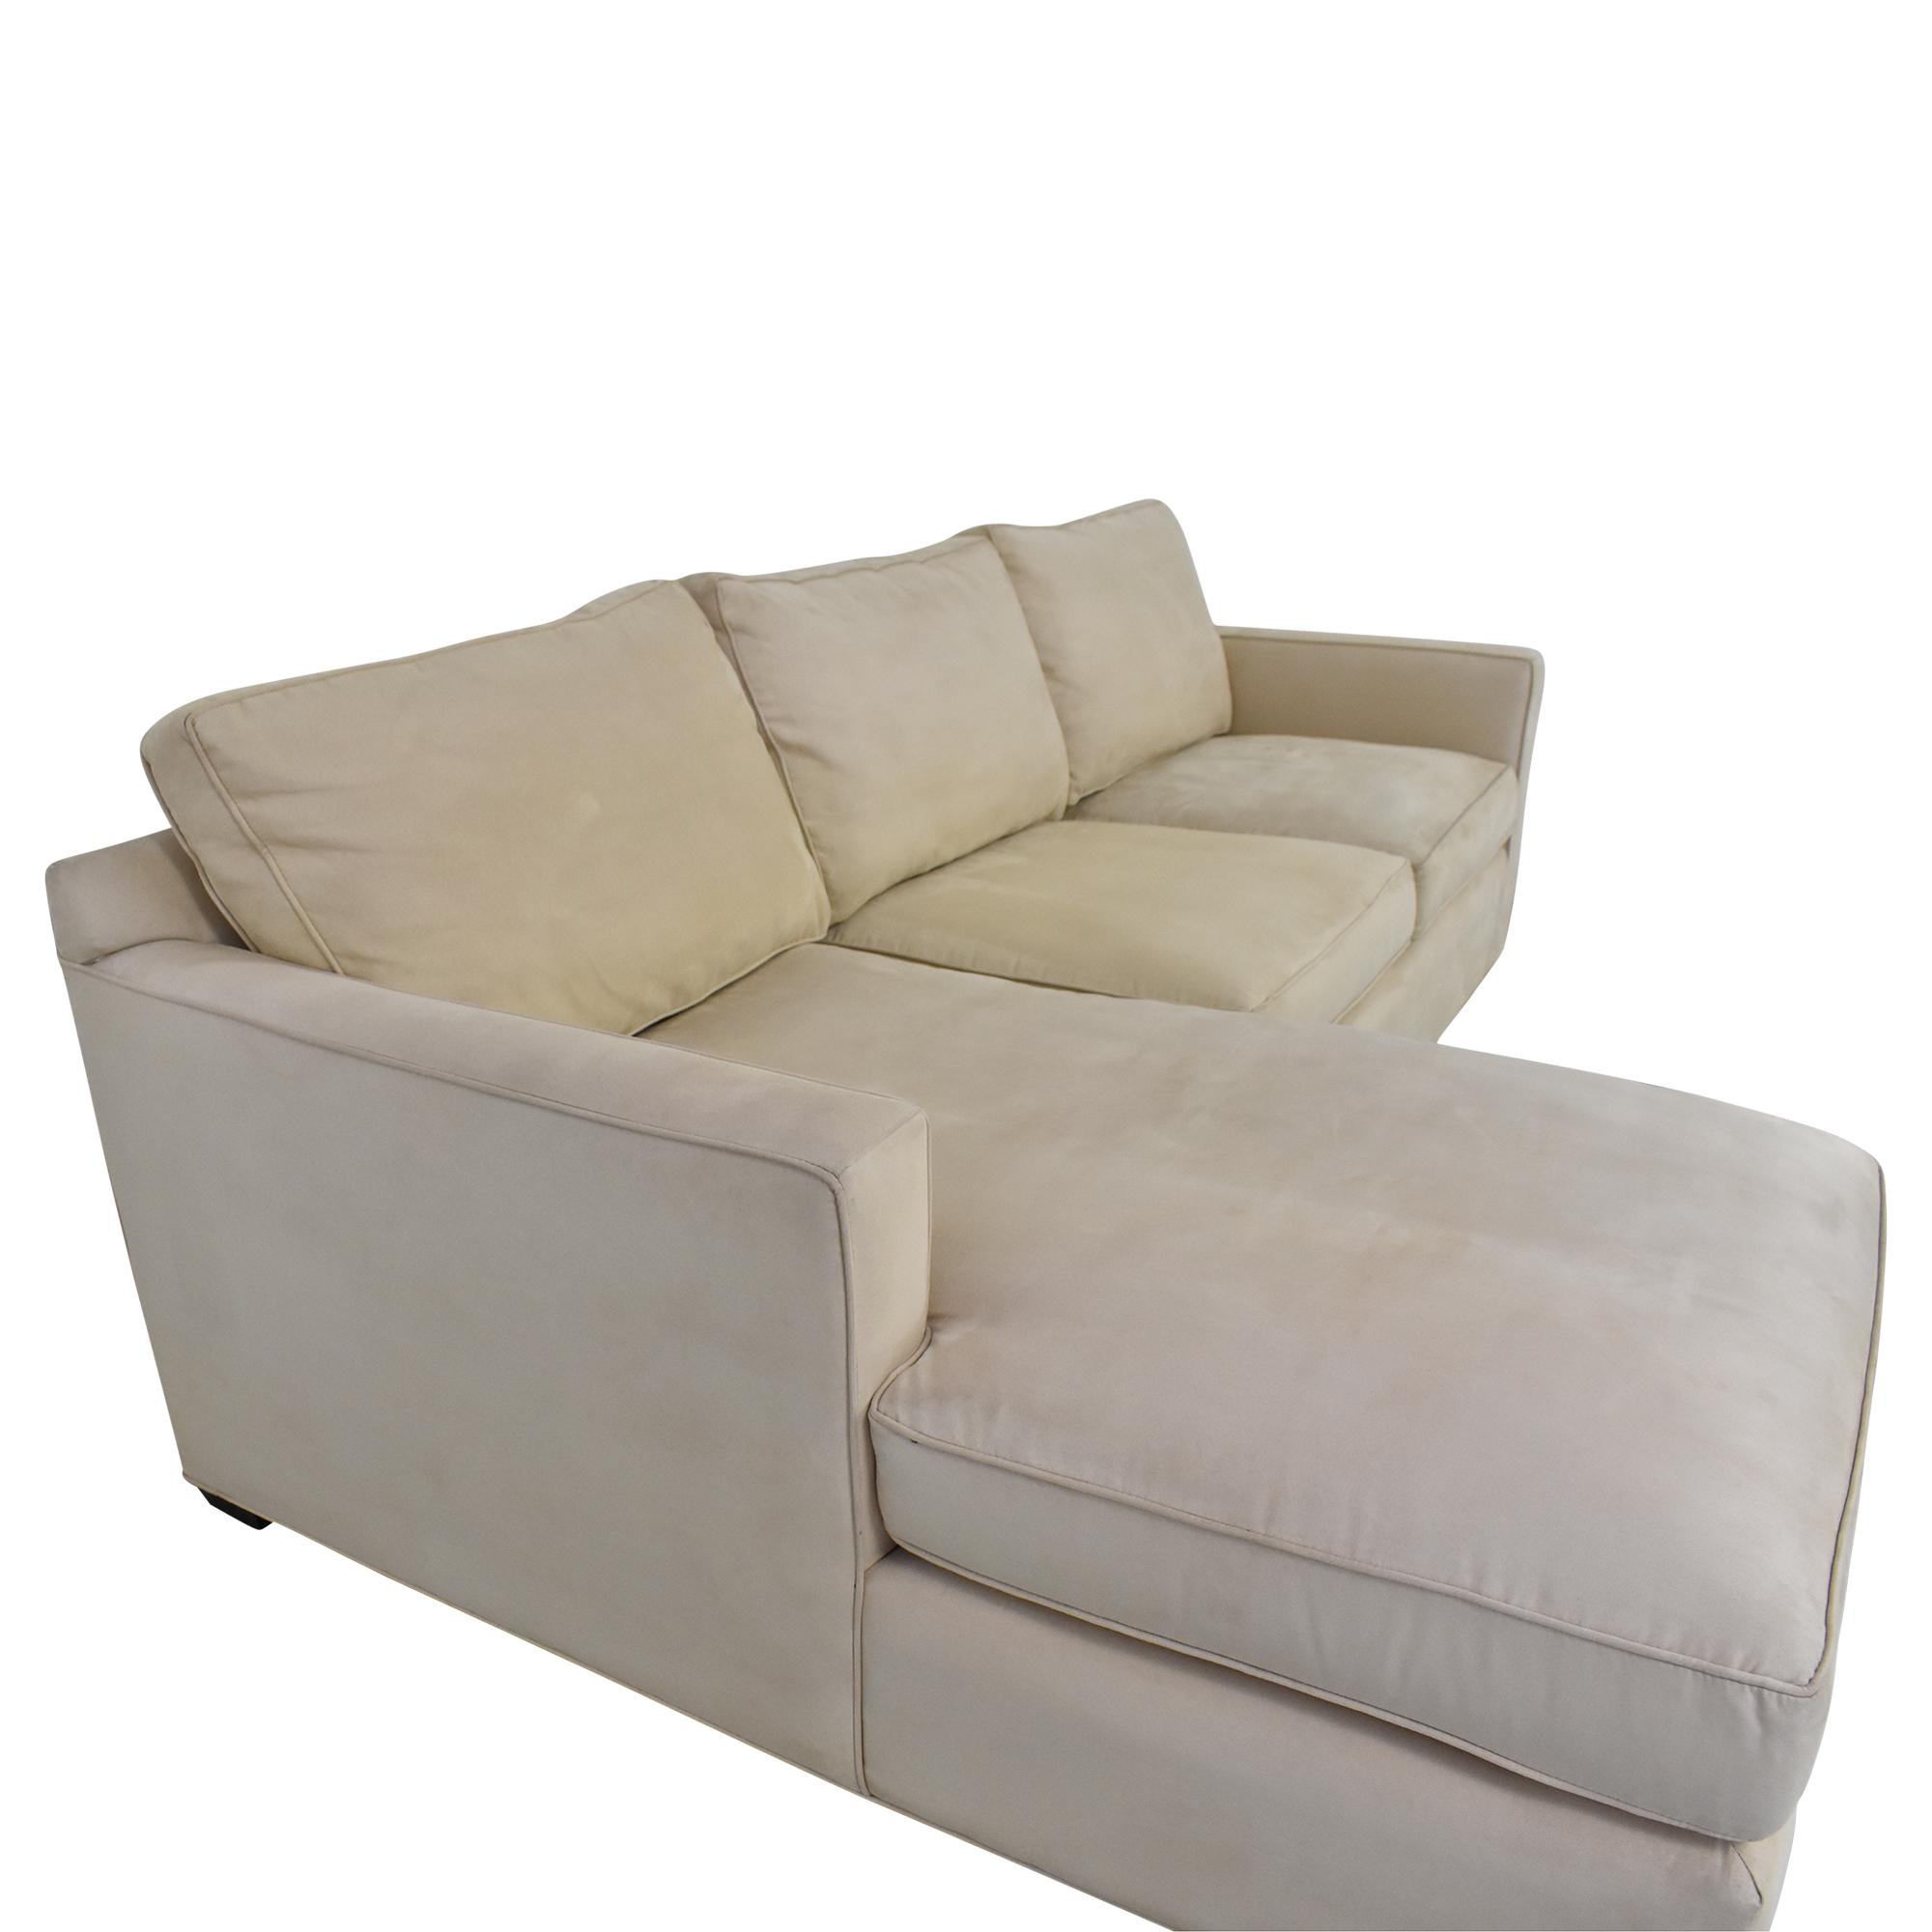 shop Crate & Barrel Crate & Barrel Davis Chaise Sectional Sofa online